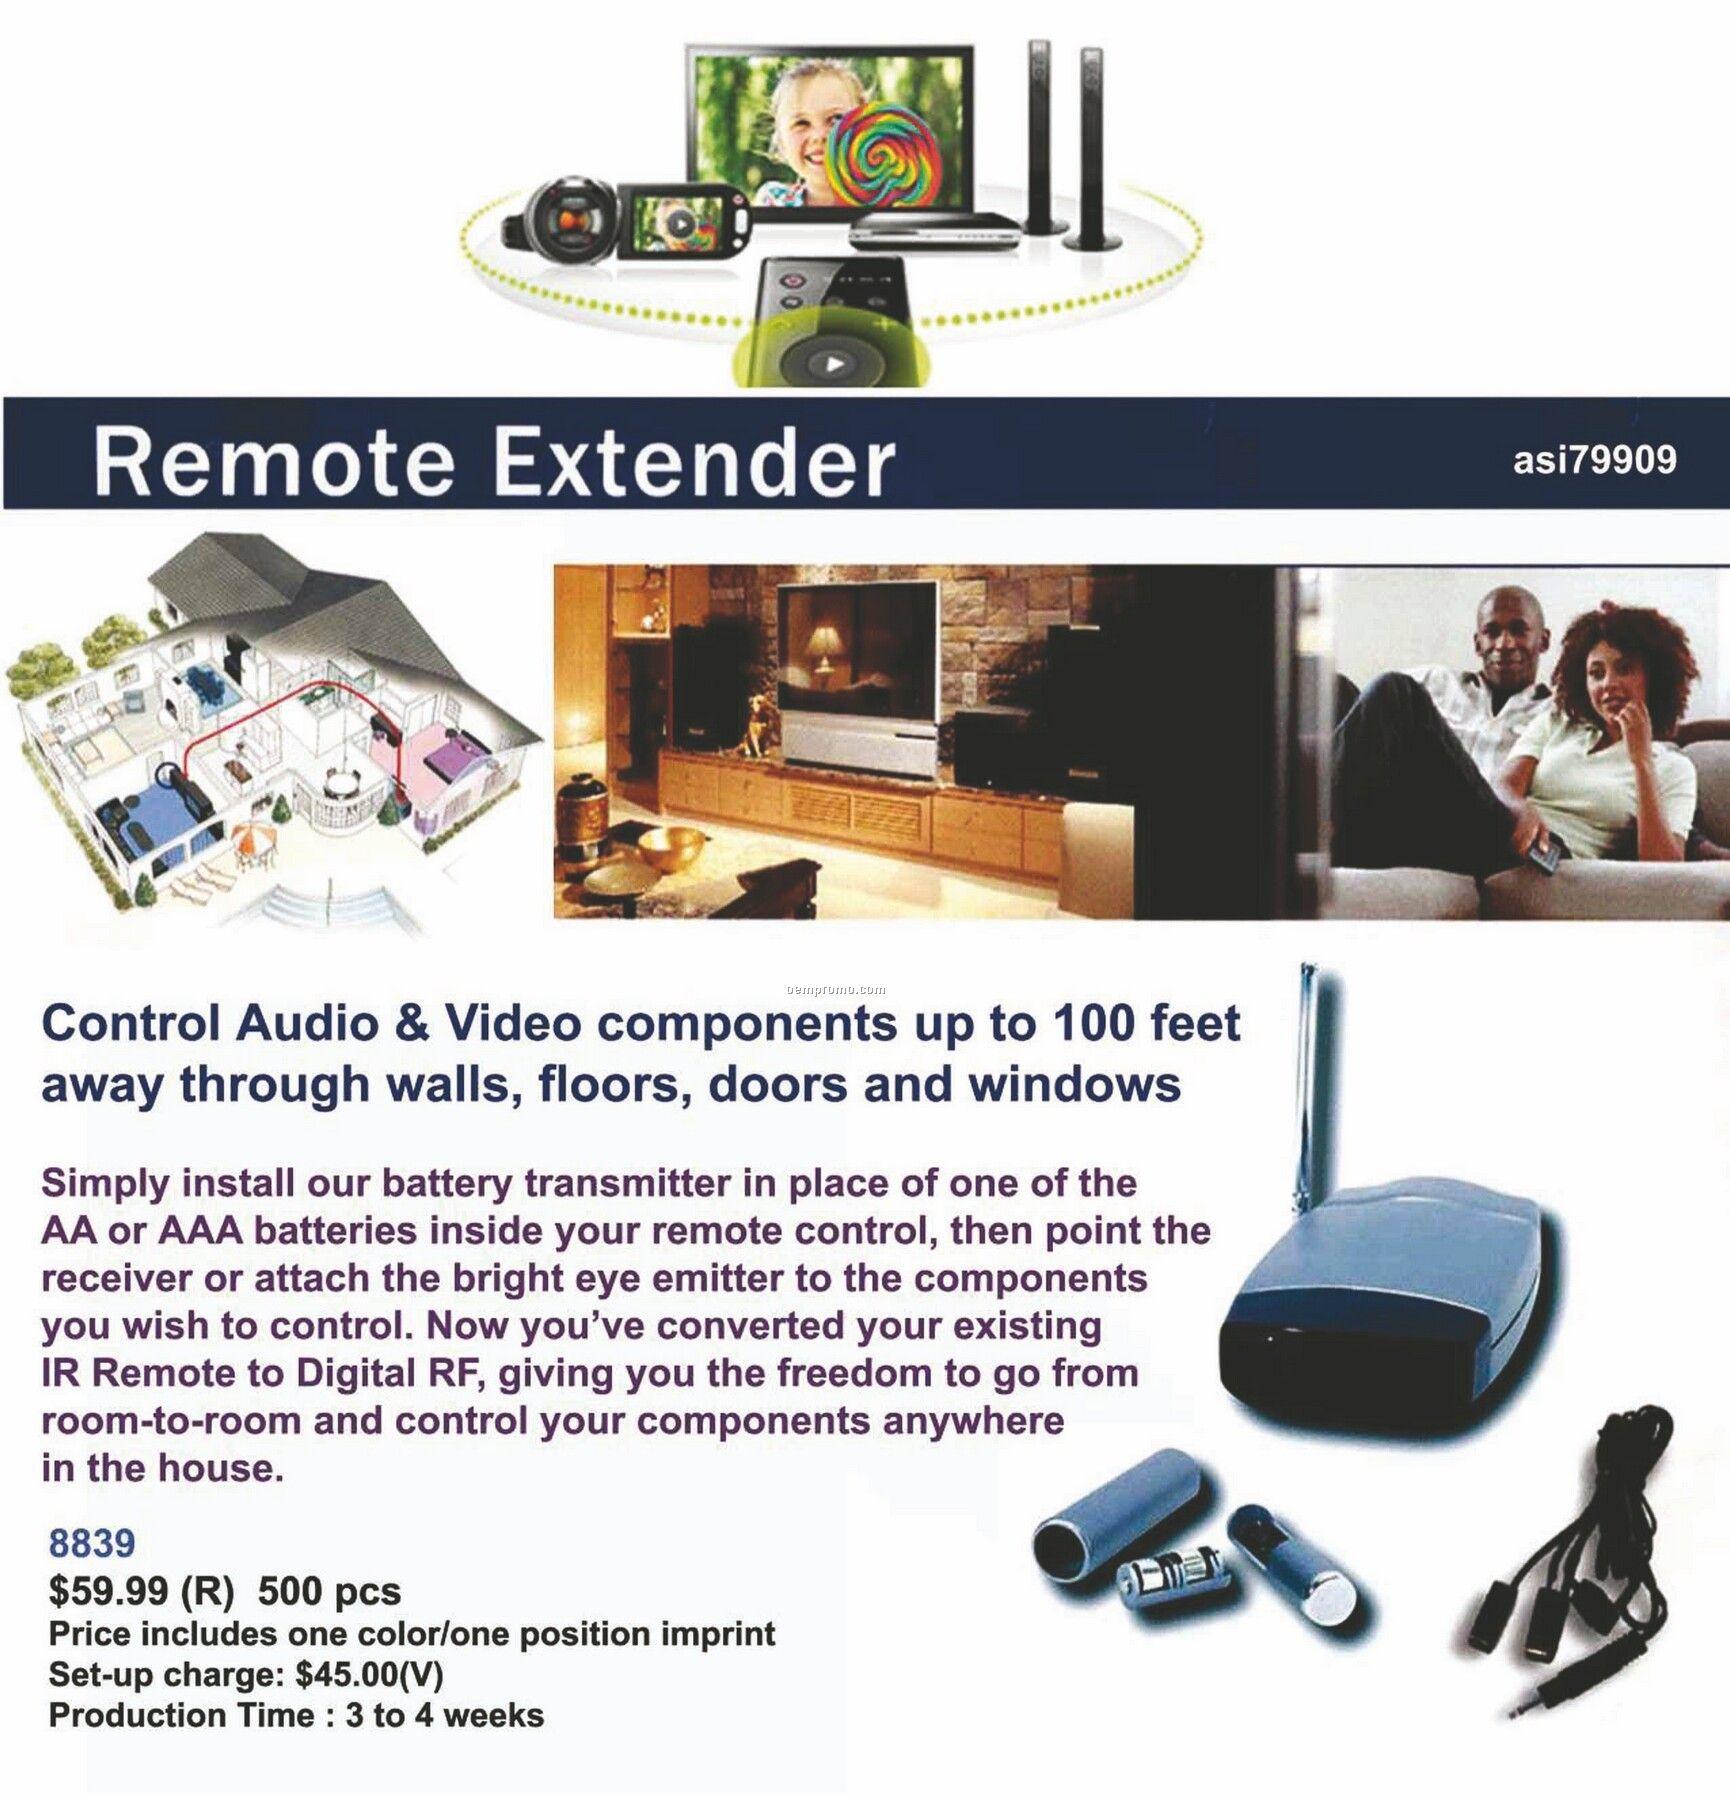 Remote Control Extender